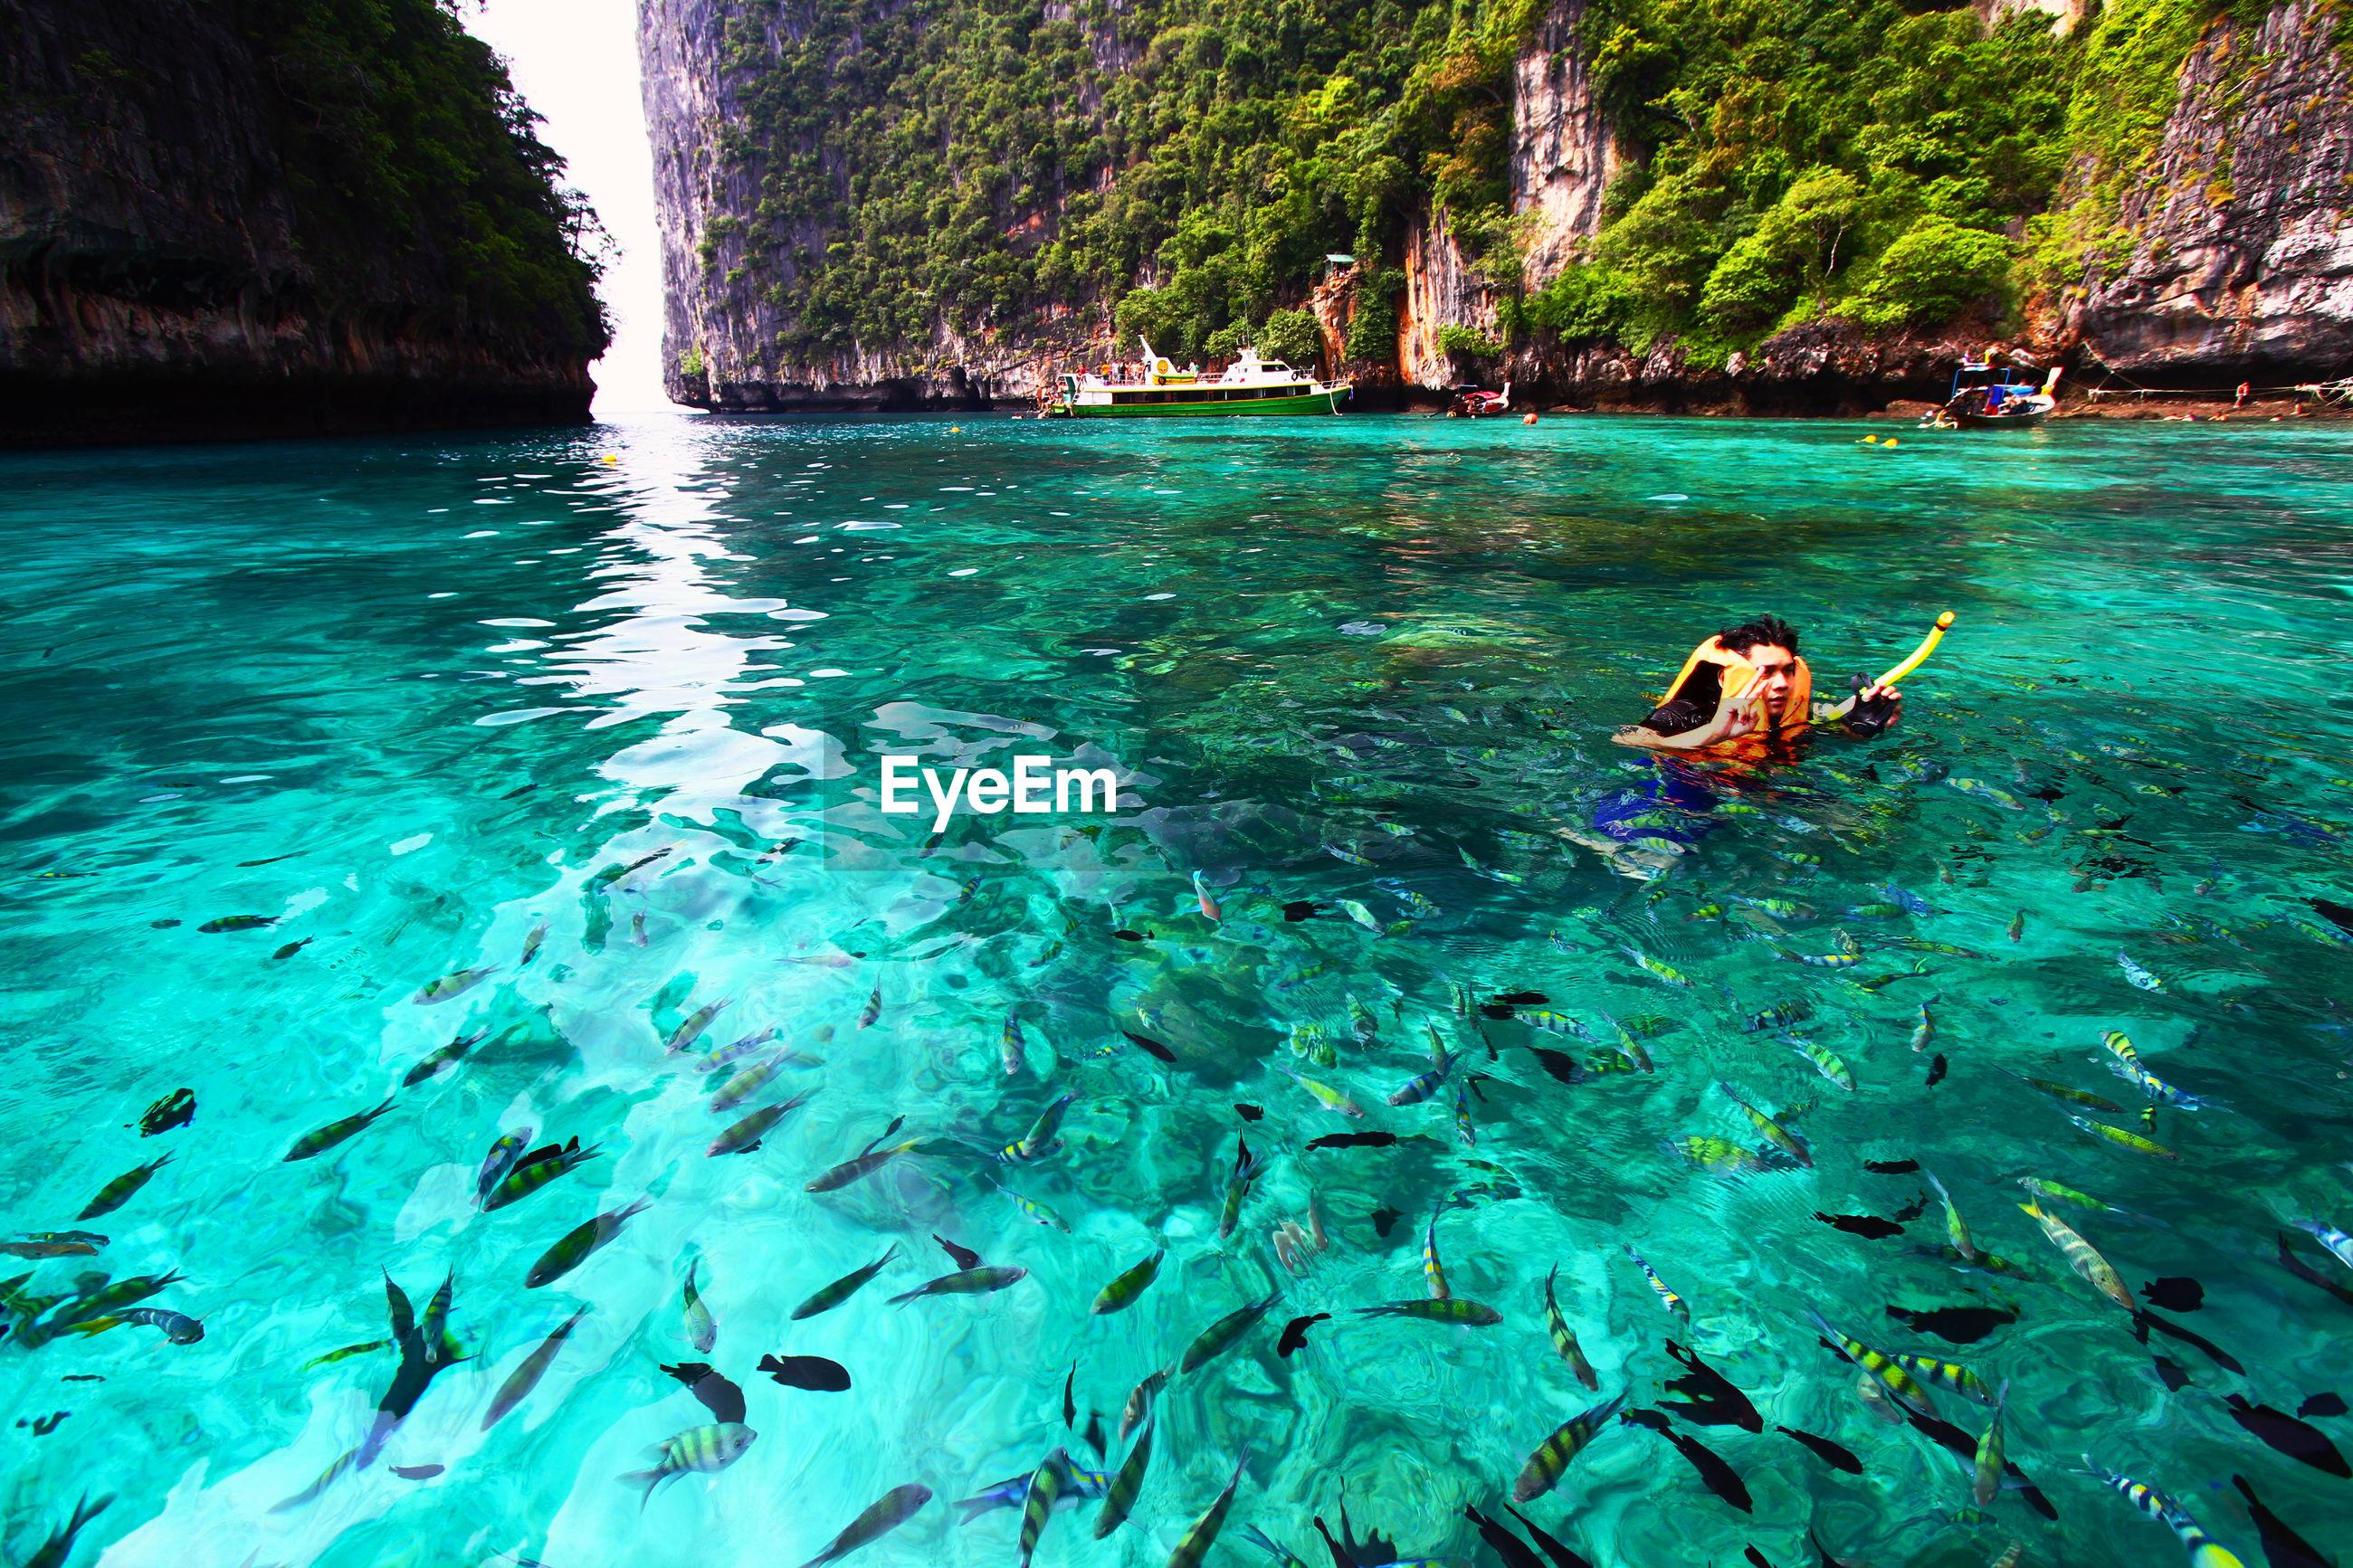 REAR VIEW OF PERSON IN SEA